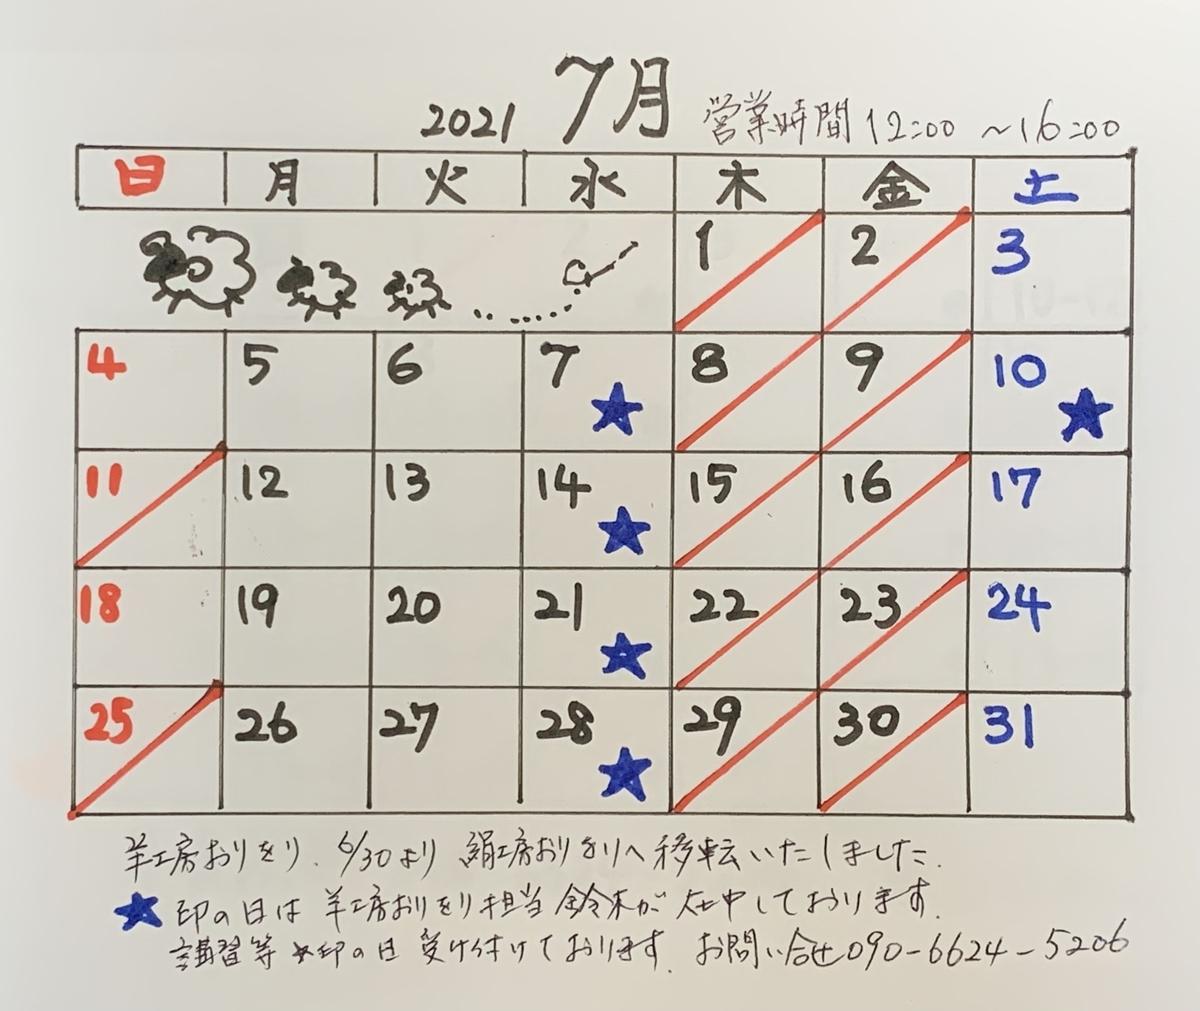 f:id:koubou-rr:20210630182427j:plain